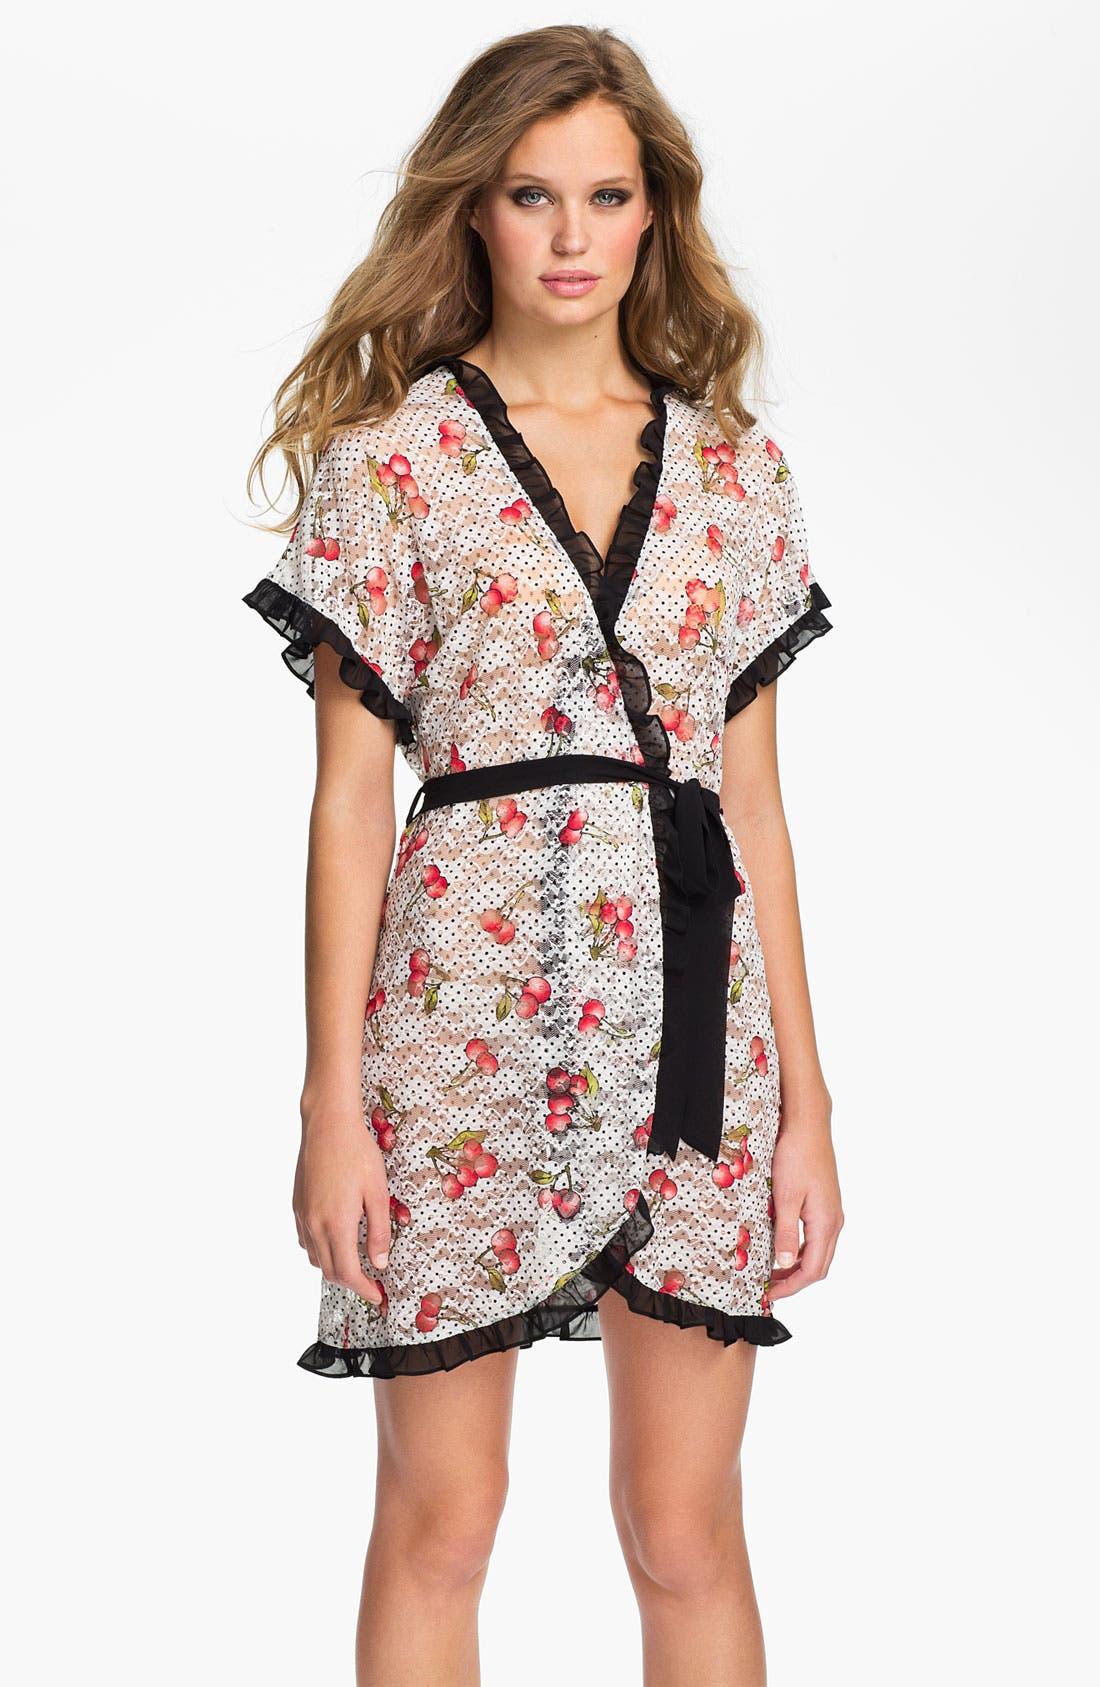 Alternate Image 1 Selected - In Bloom by Jonquil 'Cherries' Robe